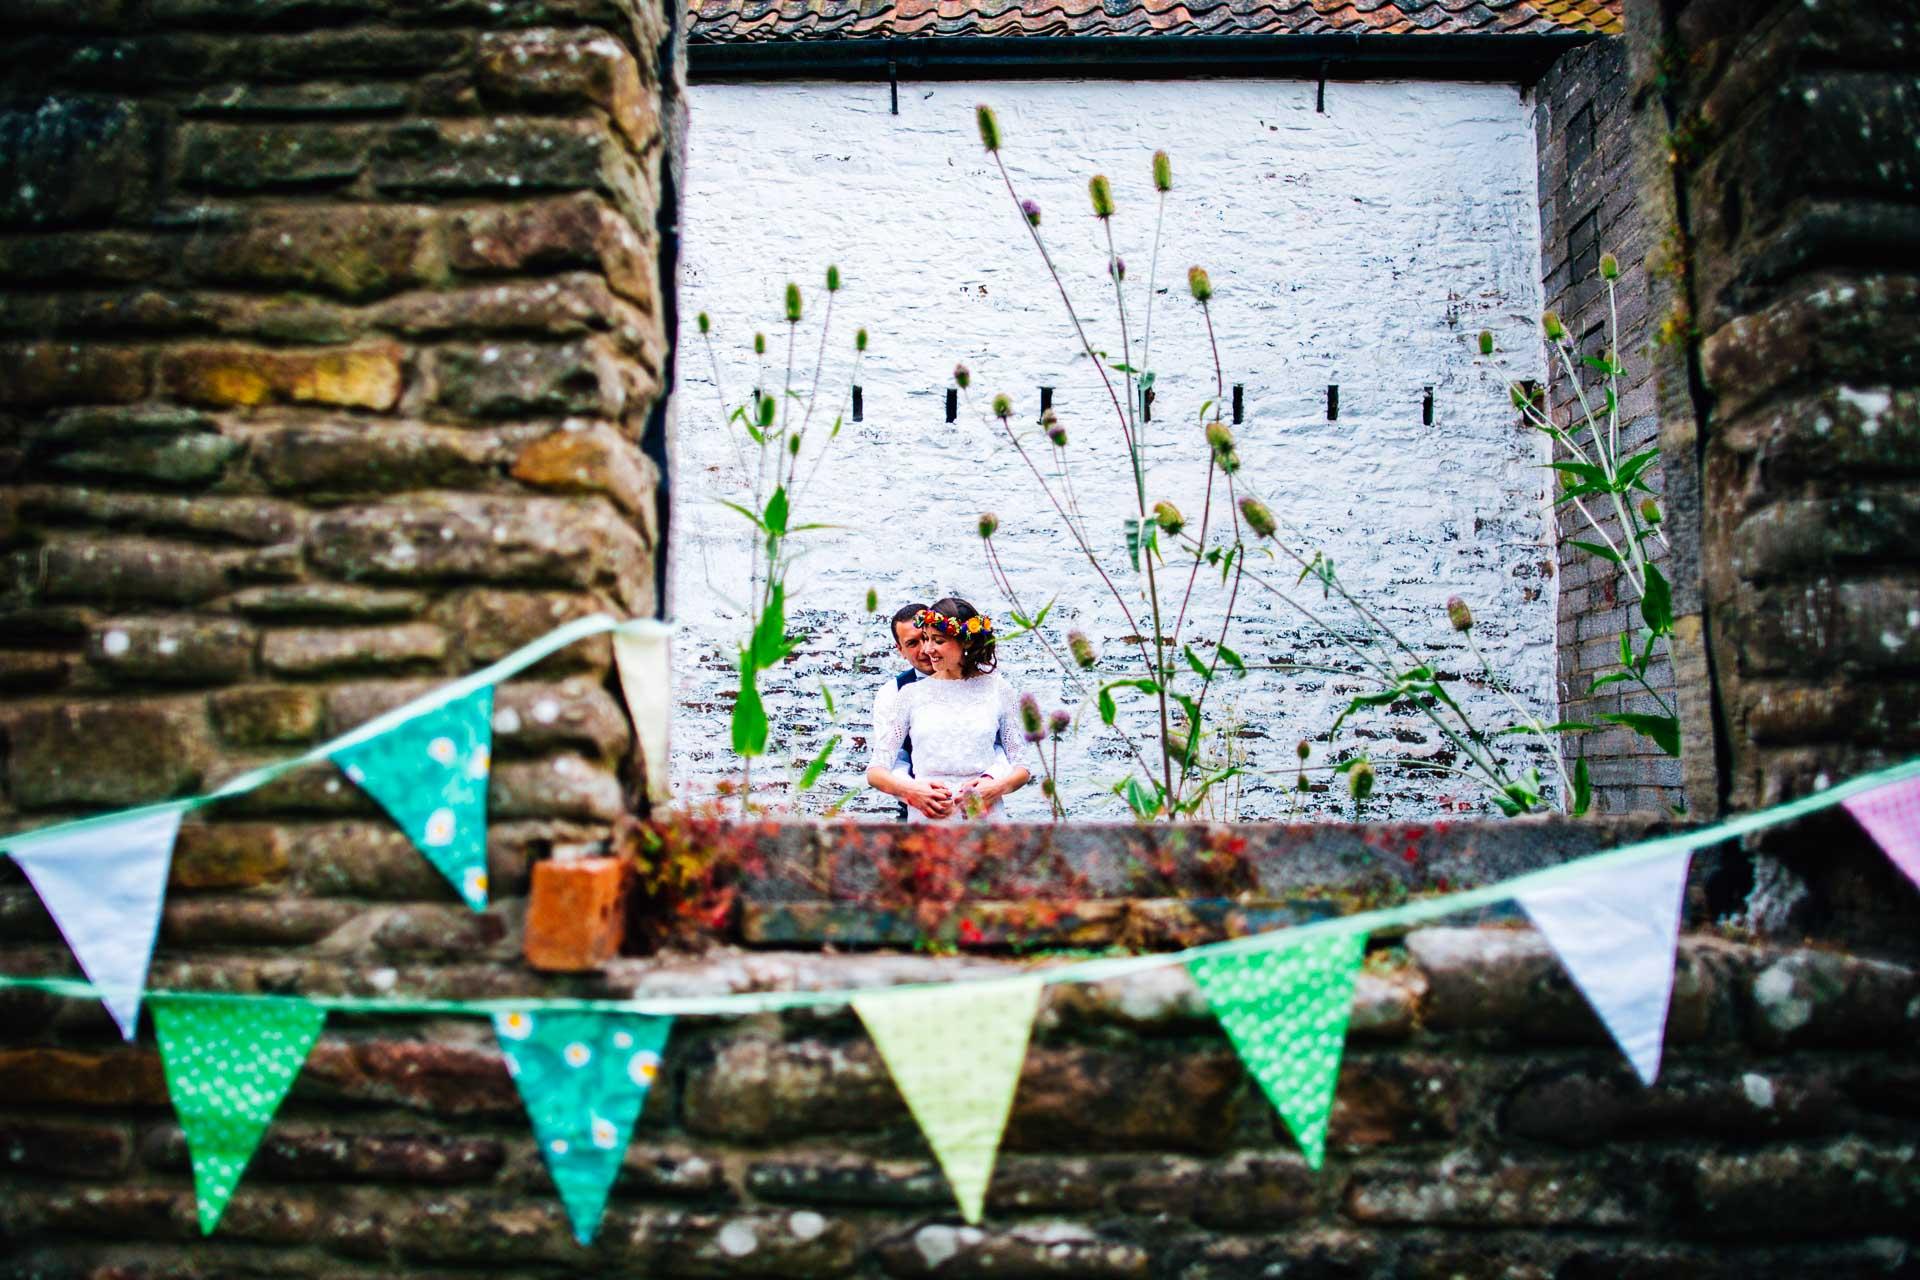 winterbourne-medieval-barn-wedding-photography-emma-andrew-90